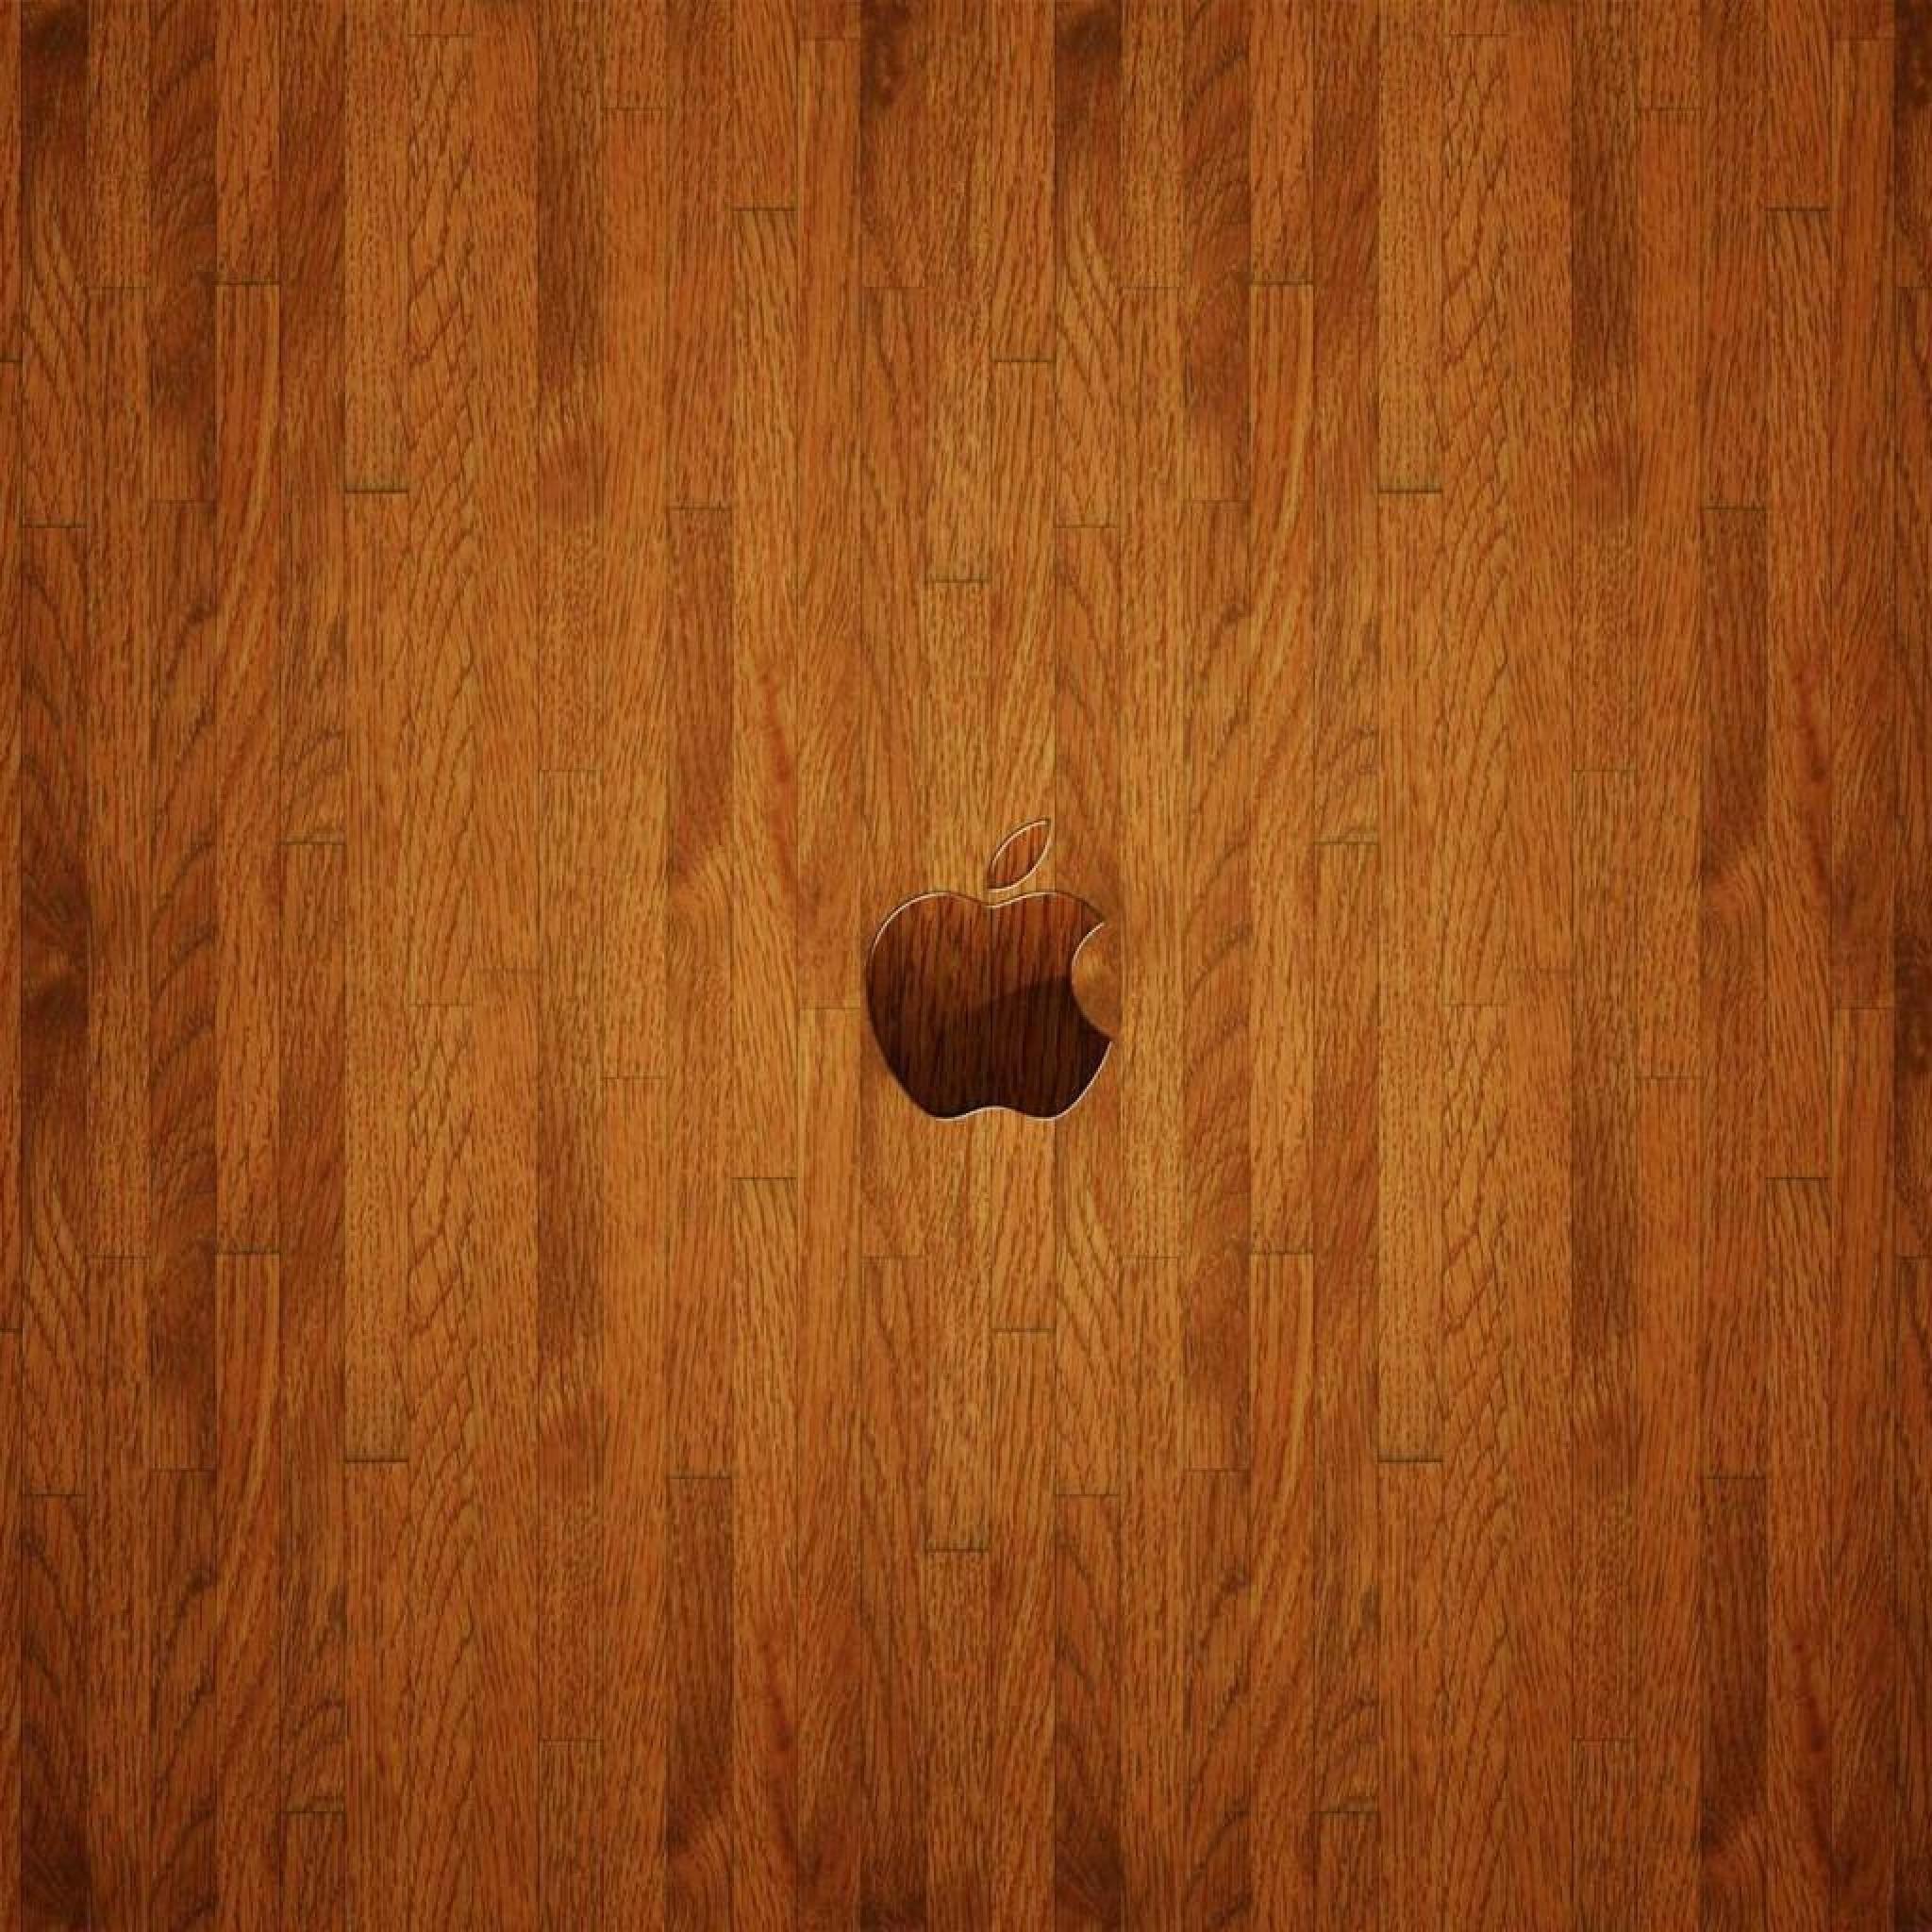 Res: 2048x2048, Apple Logo On Parquet Wood Floor